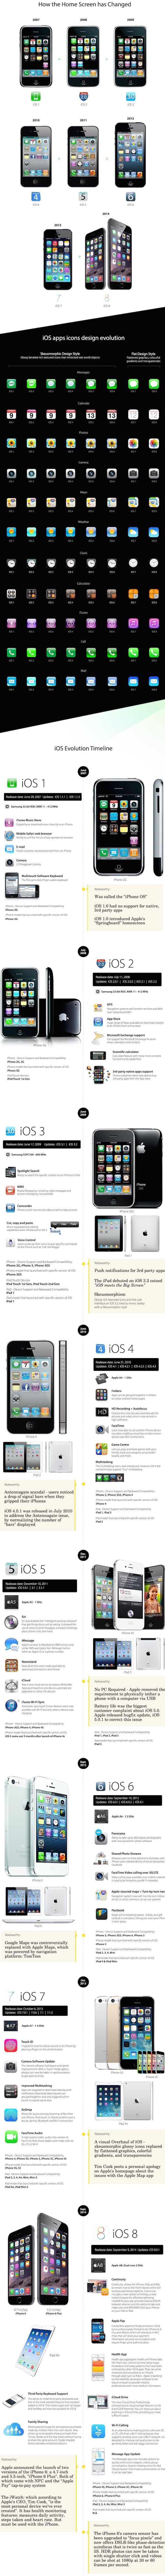 эволюция iOS - от iPhone 2 до iPhone 6